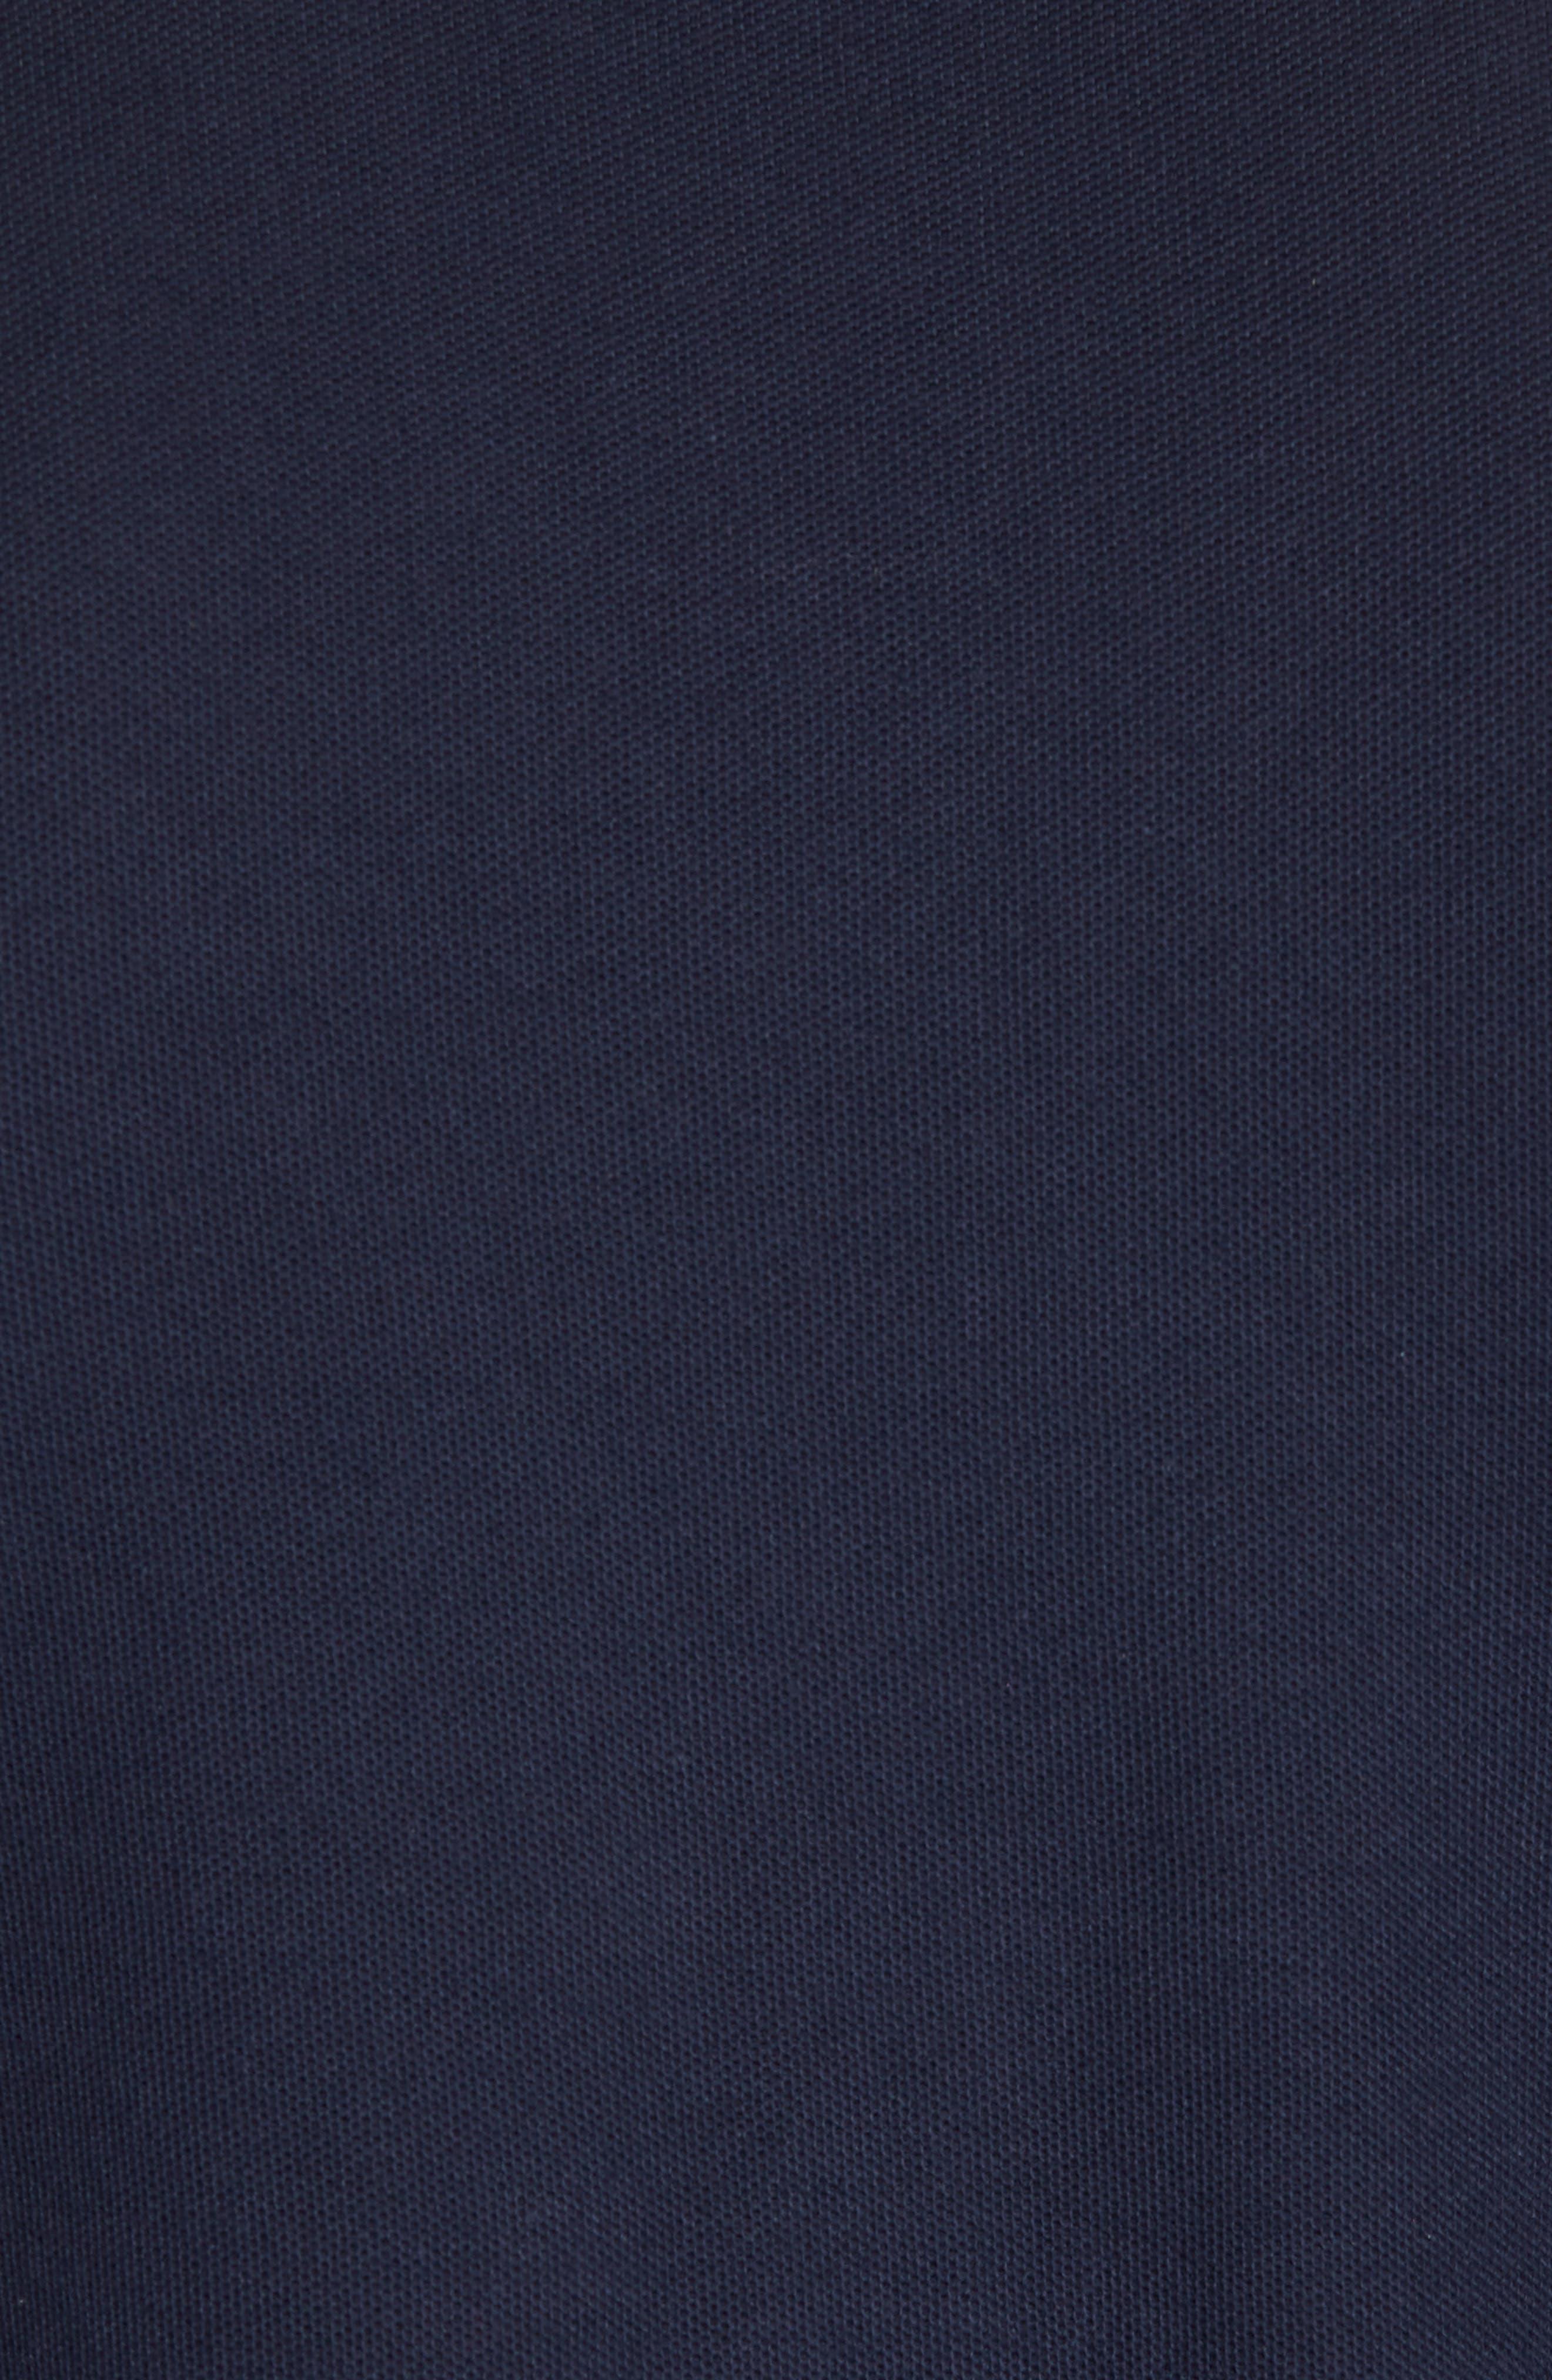 Classic Piqué Polo,                             Alternate thumbnail 5, color,                             Navy